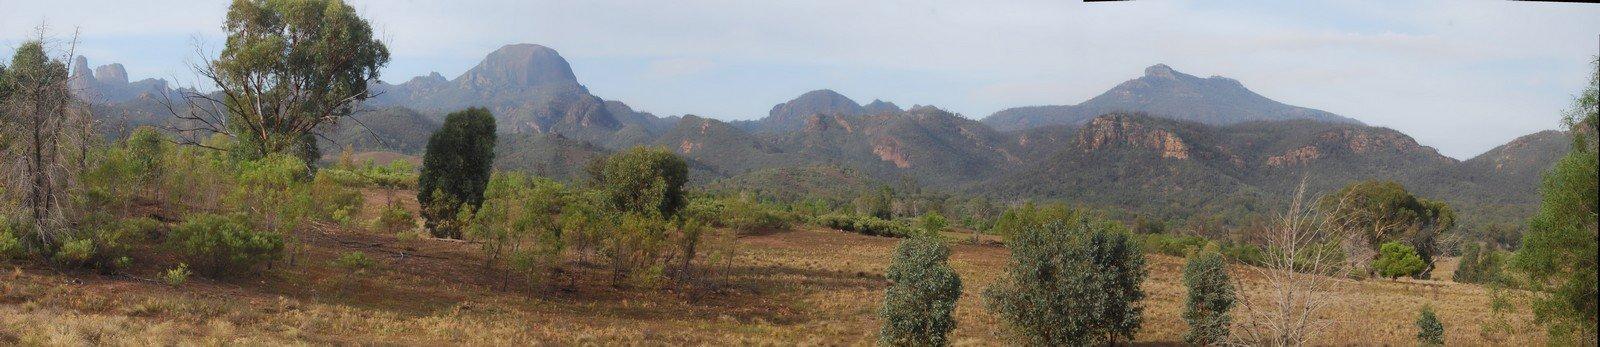 Warrumbungles from Belougery Flats